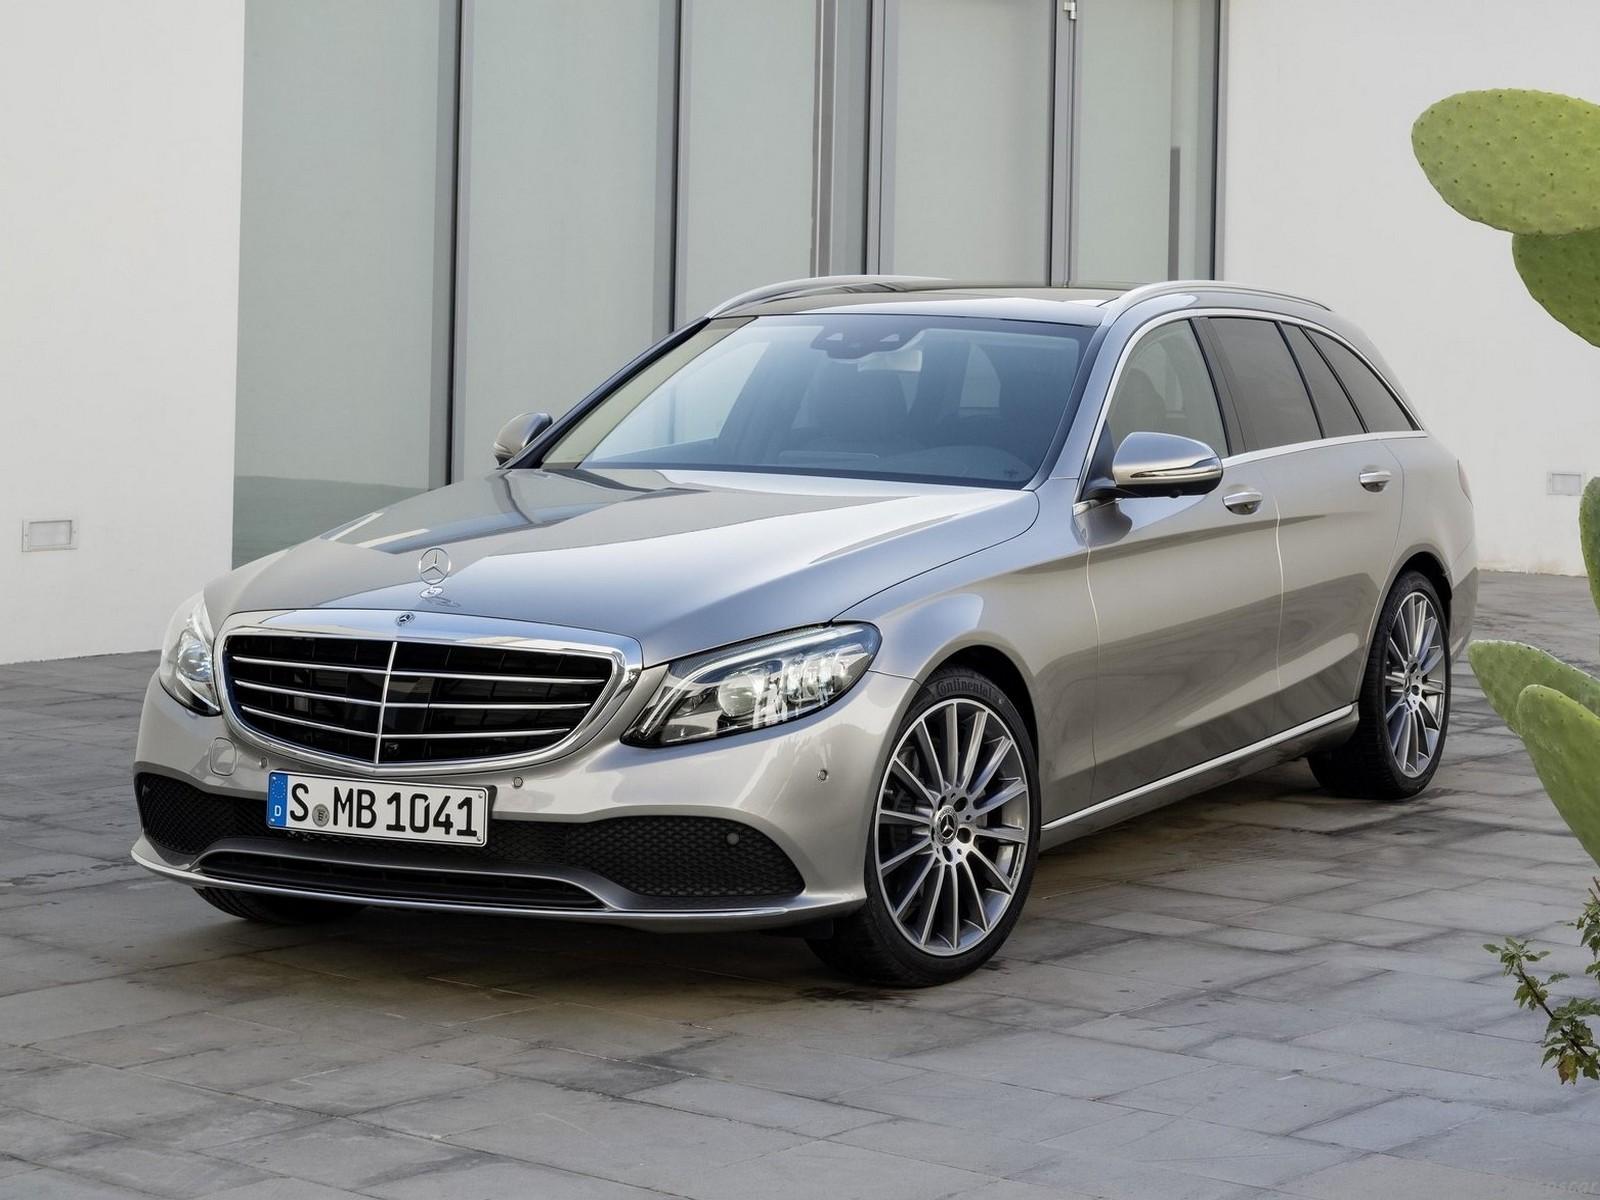 Mercedes Classe C Estate 2019 - 01